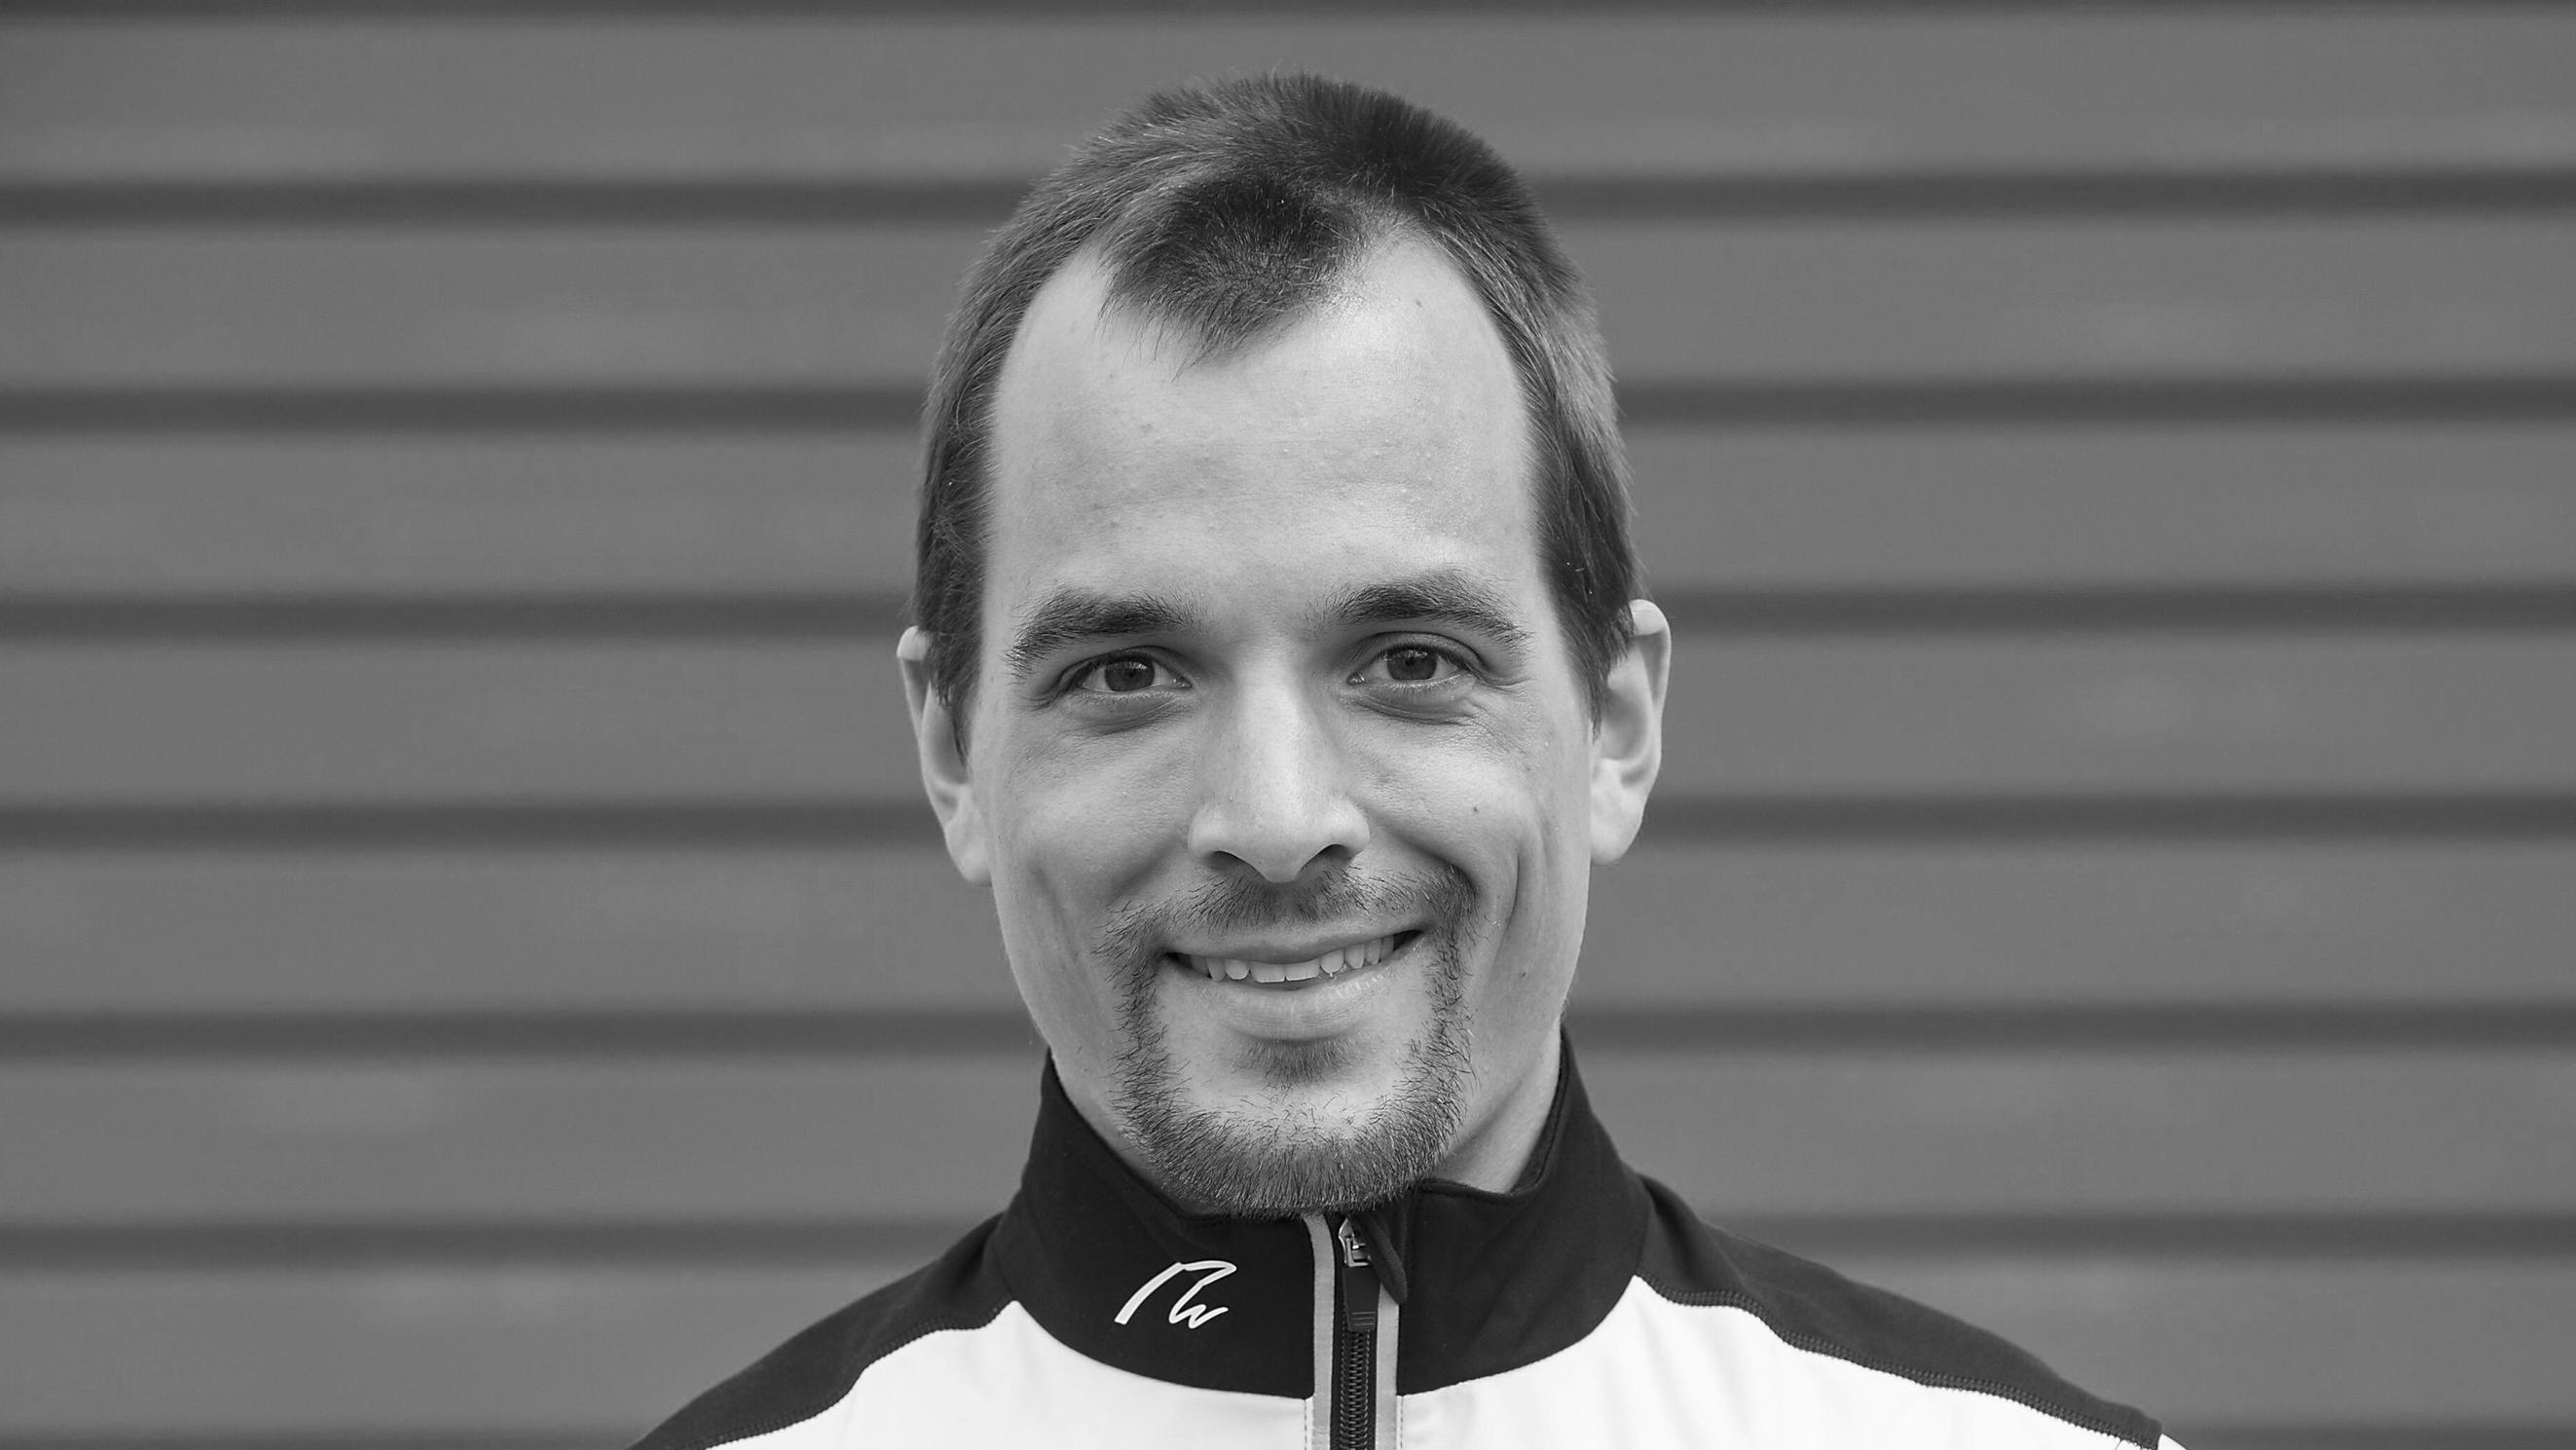 Maximilian Reinelt: Maximilian Reinelt Ist Tot: Ruder-Olympiasieger Stirbt